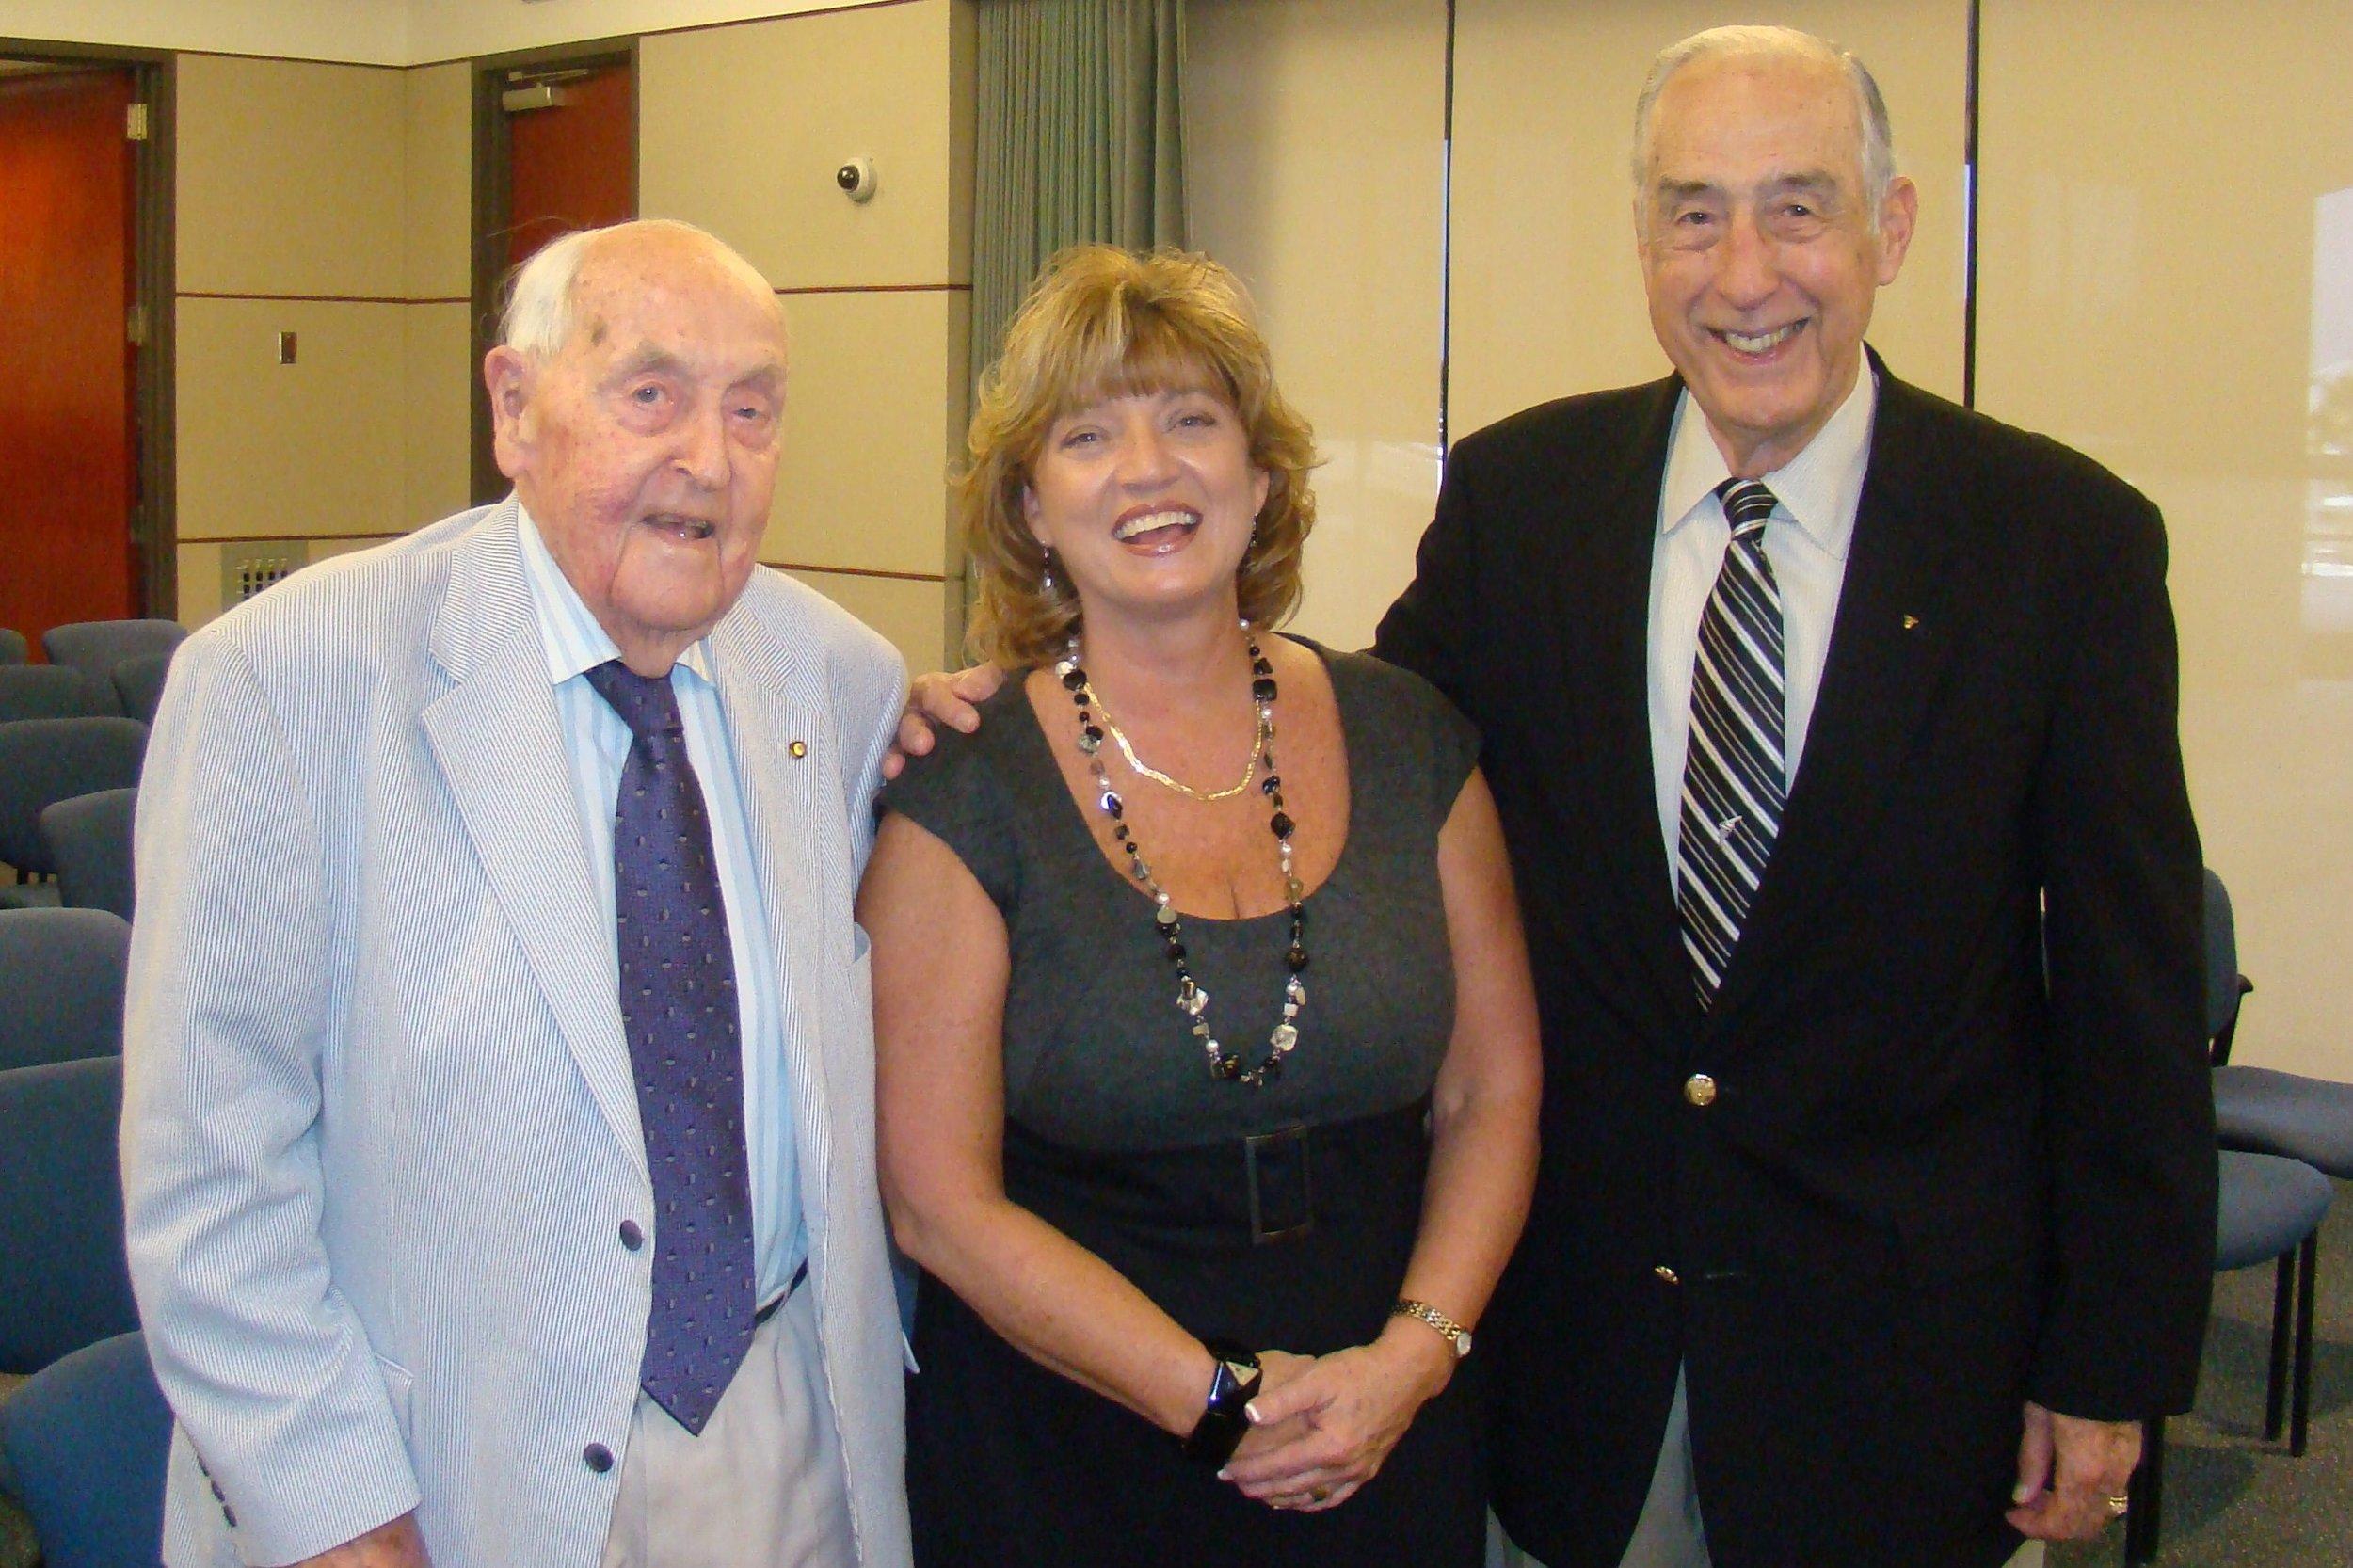 Sir Lenox, Colleen Picard & Dick Newton - 1, 27 Oct '11 - Copy.JPG